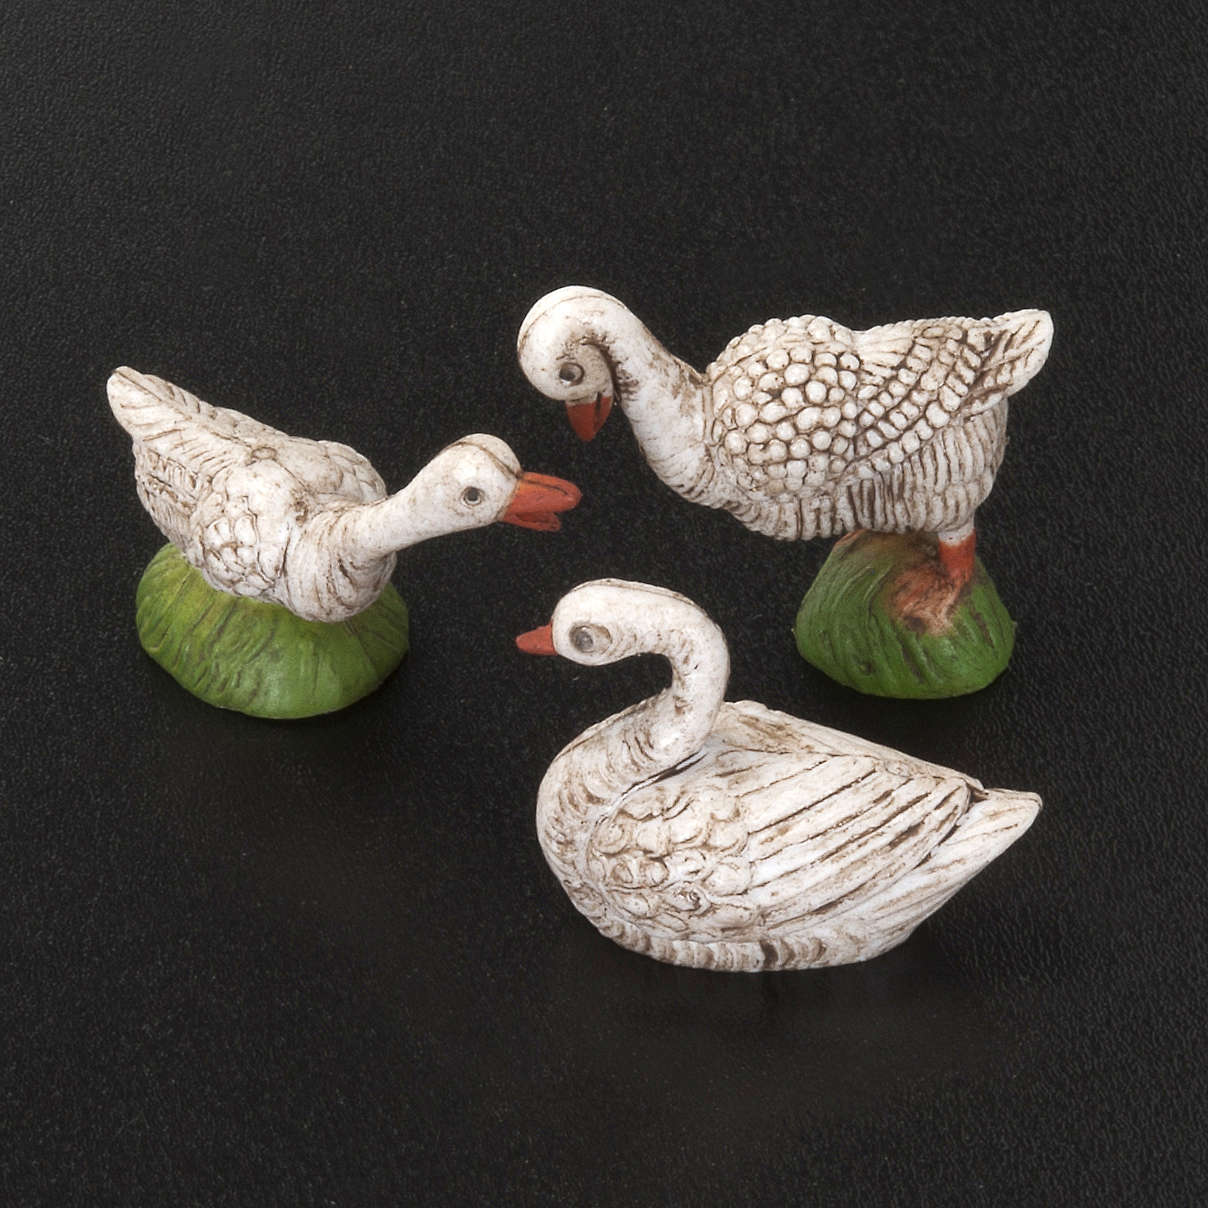 Nativity scene figurines, ducks, 6 pieces 3